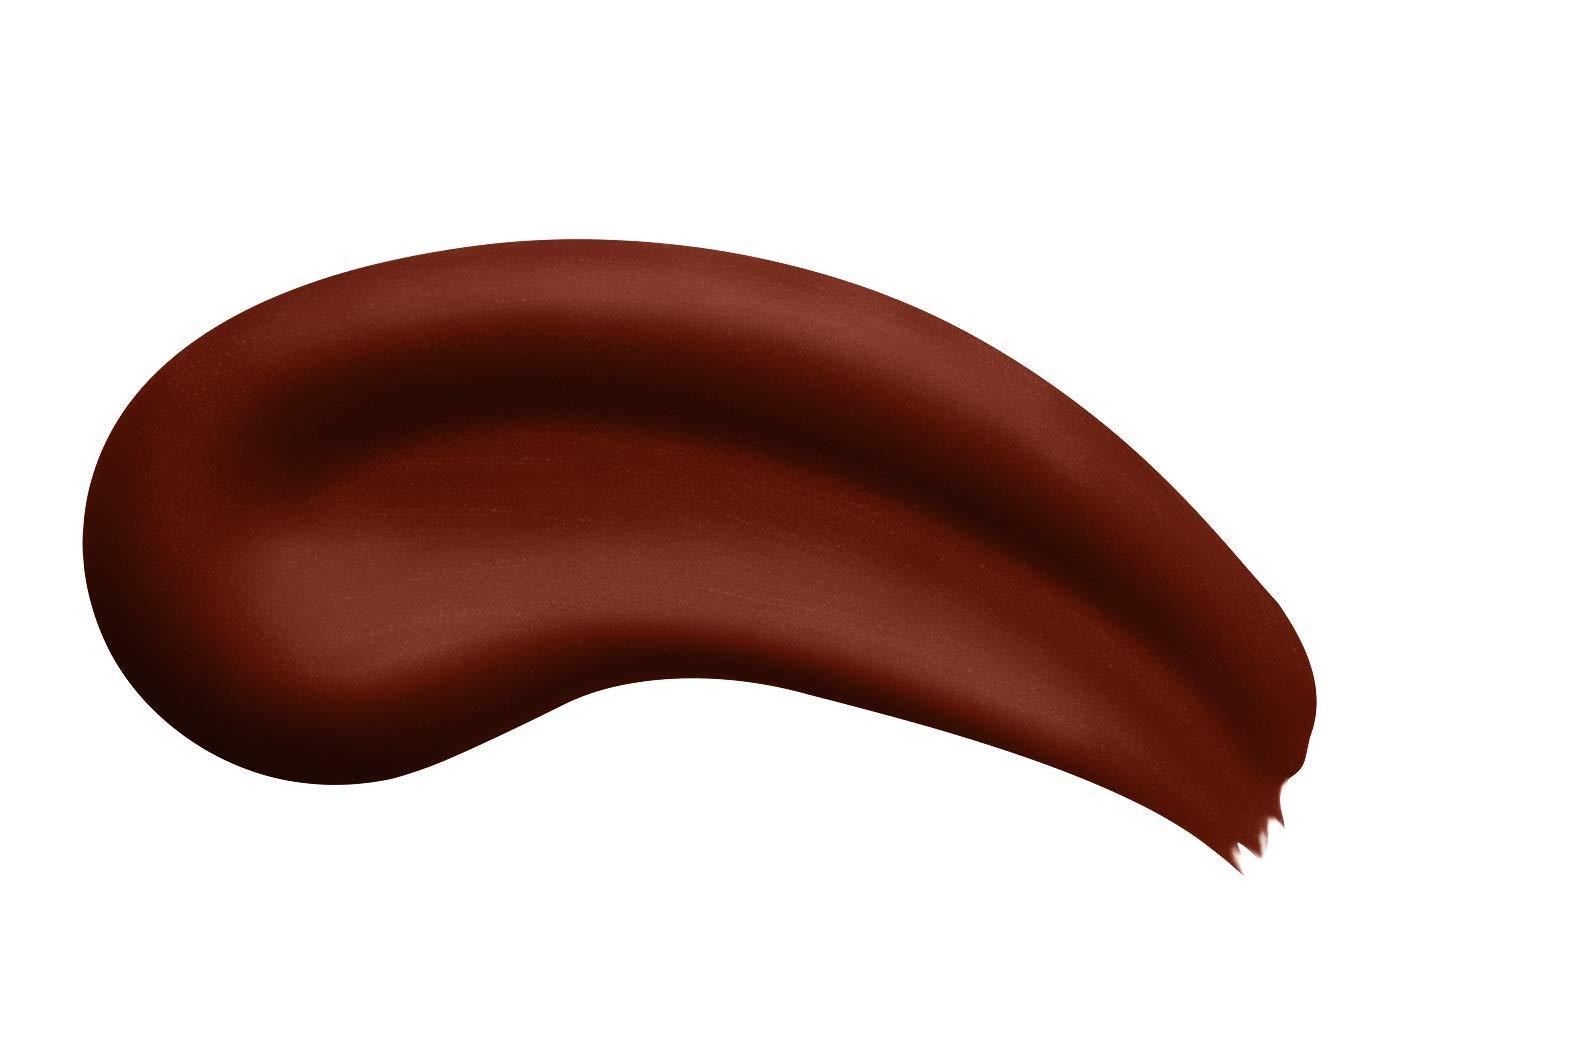 L'Oréal Paris Les Chocolats Labial Líquido Mate, Tono Marrón Nude 866 Truffa Mania